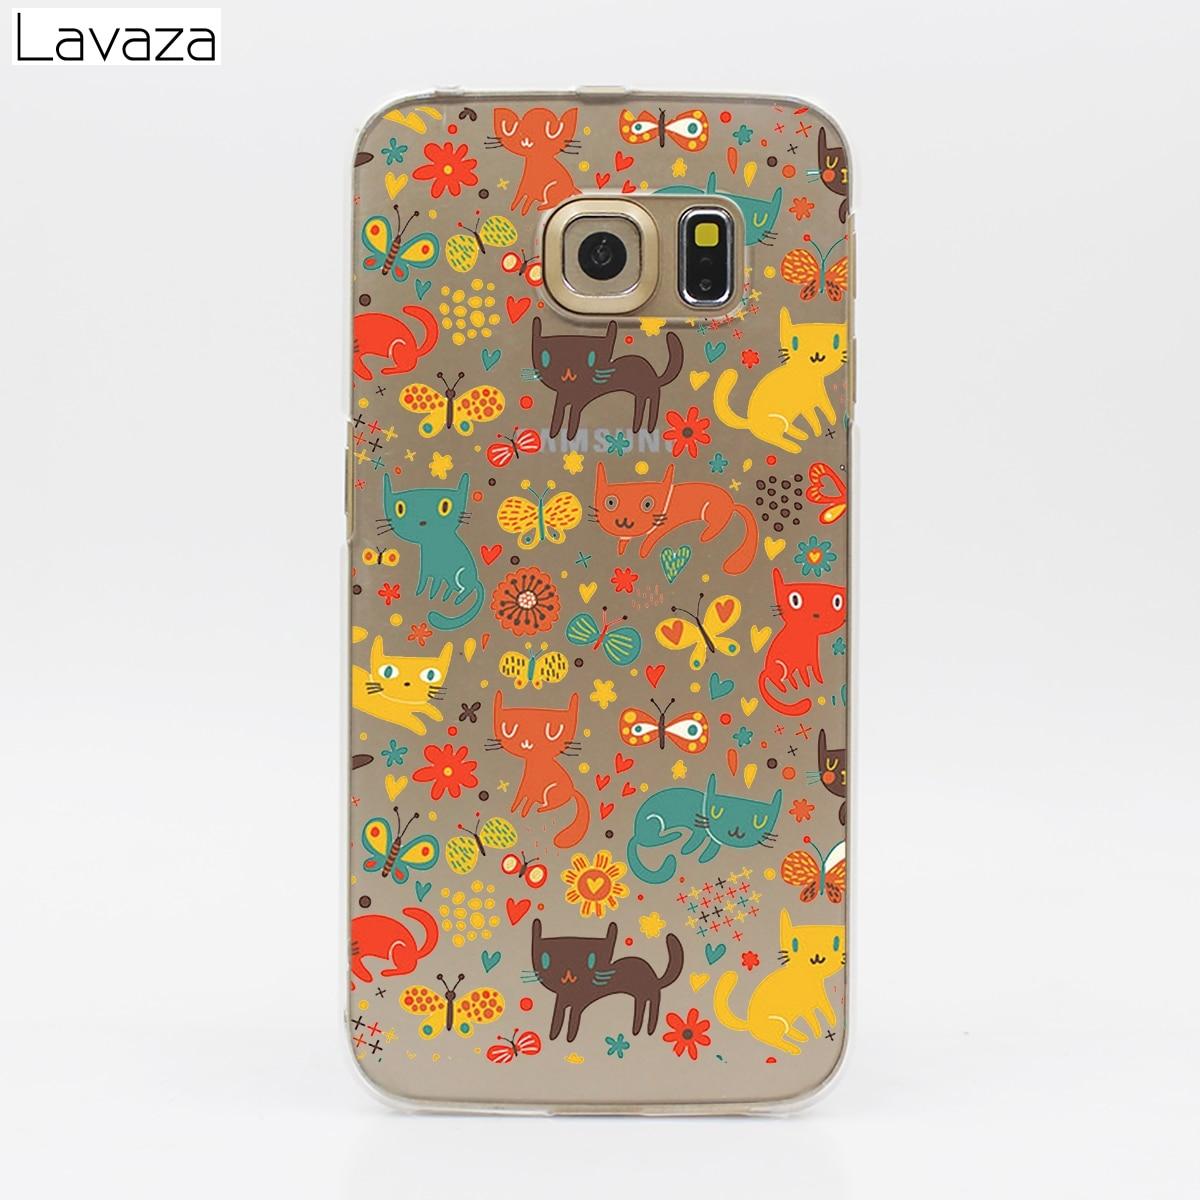 Lavaza Cute Dog Cat Mickey Hard Transparent Case for Samsung Galaxy S3 S4 S5 & Mini S6 S7 S8 S9 Edge Plus